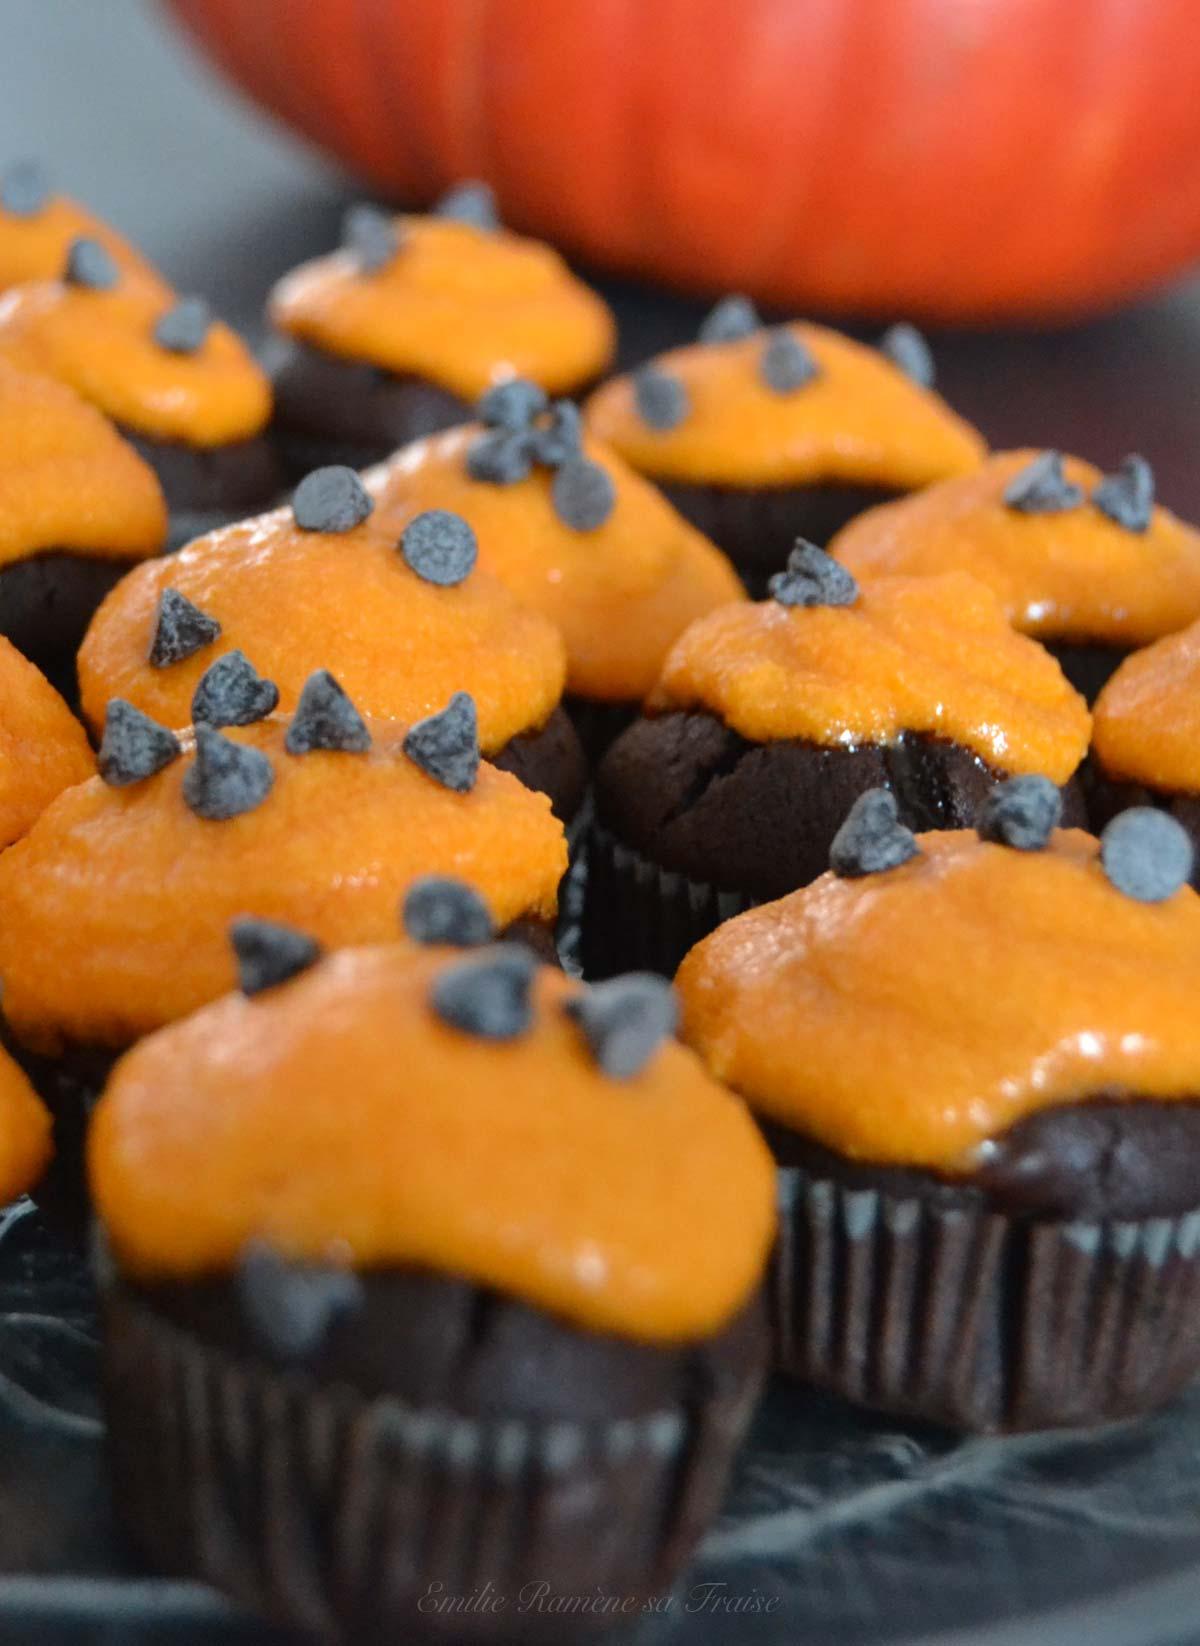 Cupcakes orange et chocolat pour Halloween